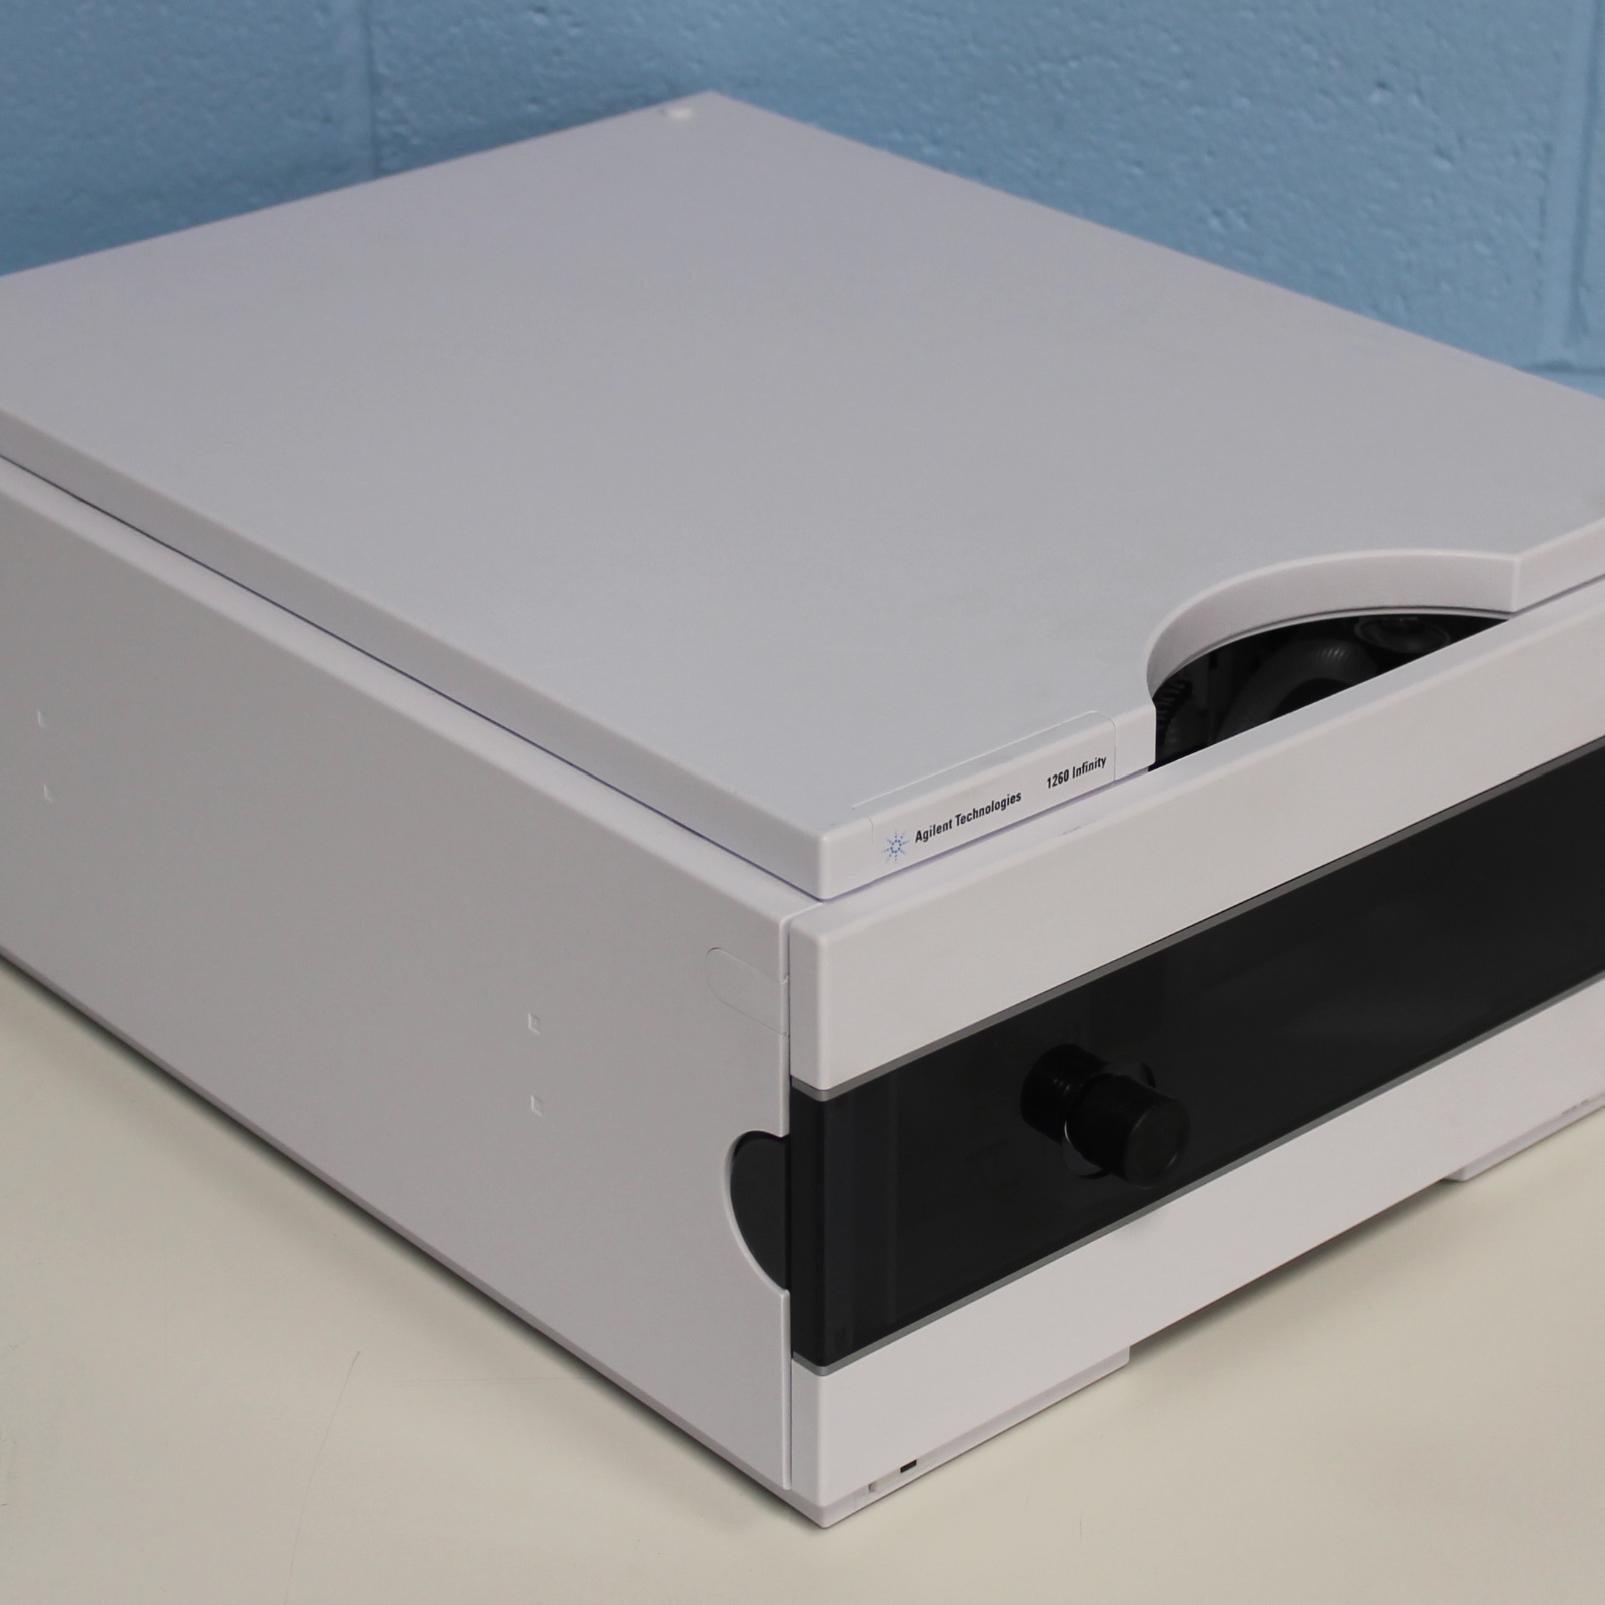 Agilent Technologies 1200 Series (G1310B) 1260 Infinity Isocratic Pump Image